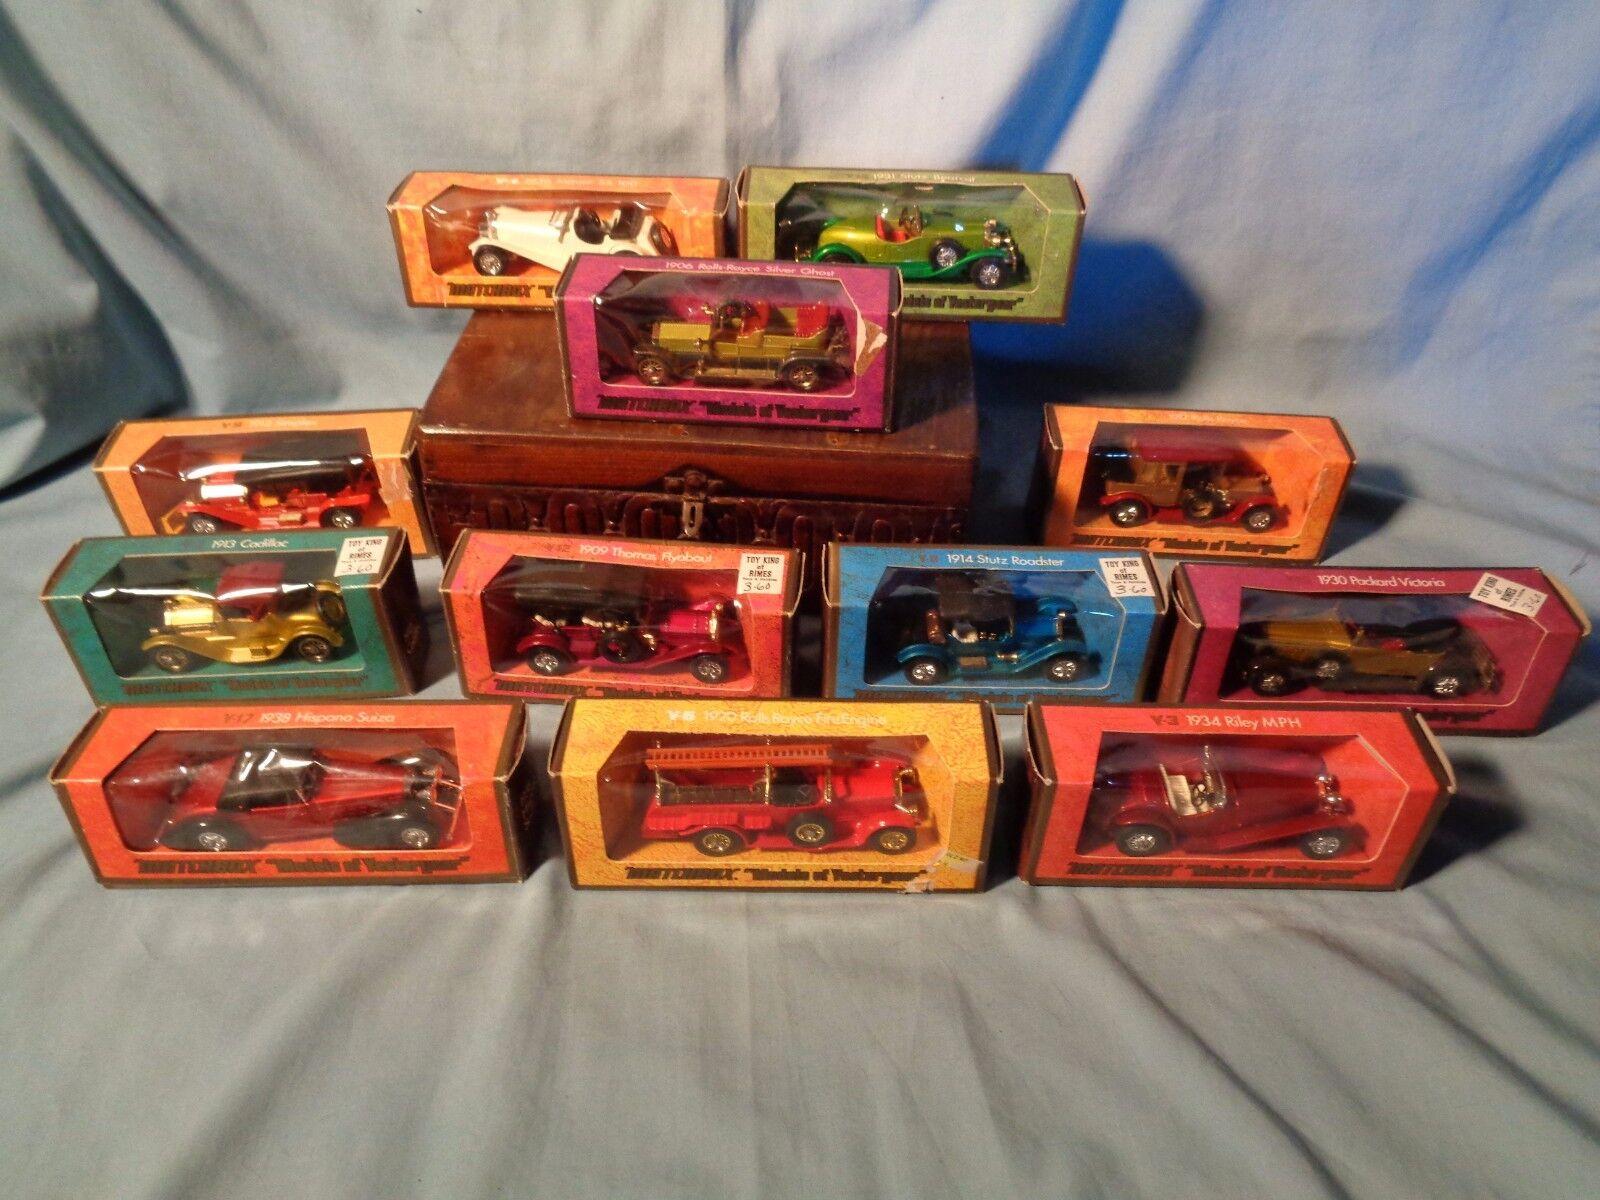 12 vintage 1973 Diecast TOY MATCHBOX Cars Y-1 BOX Models of Yesteryear Y-17 Y-6